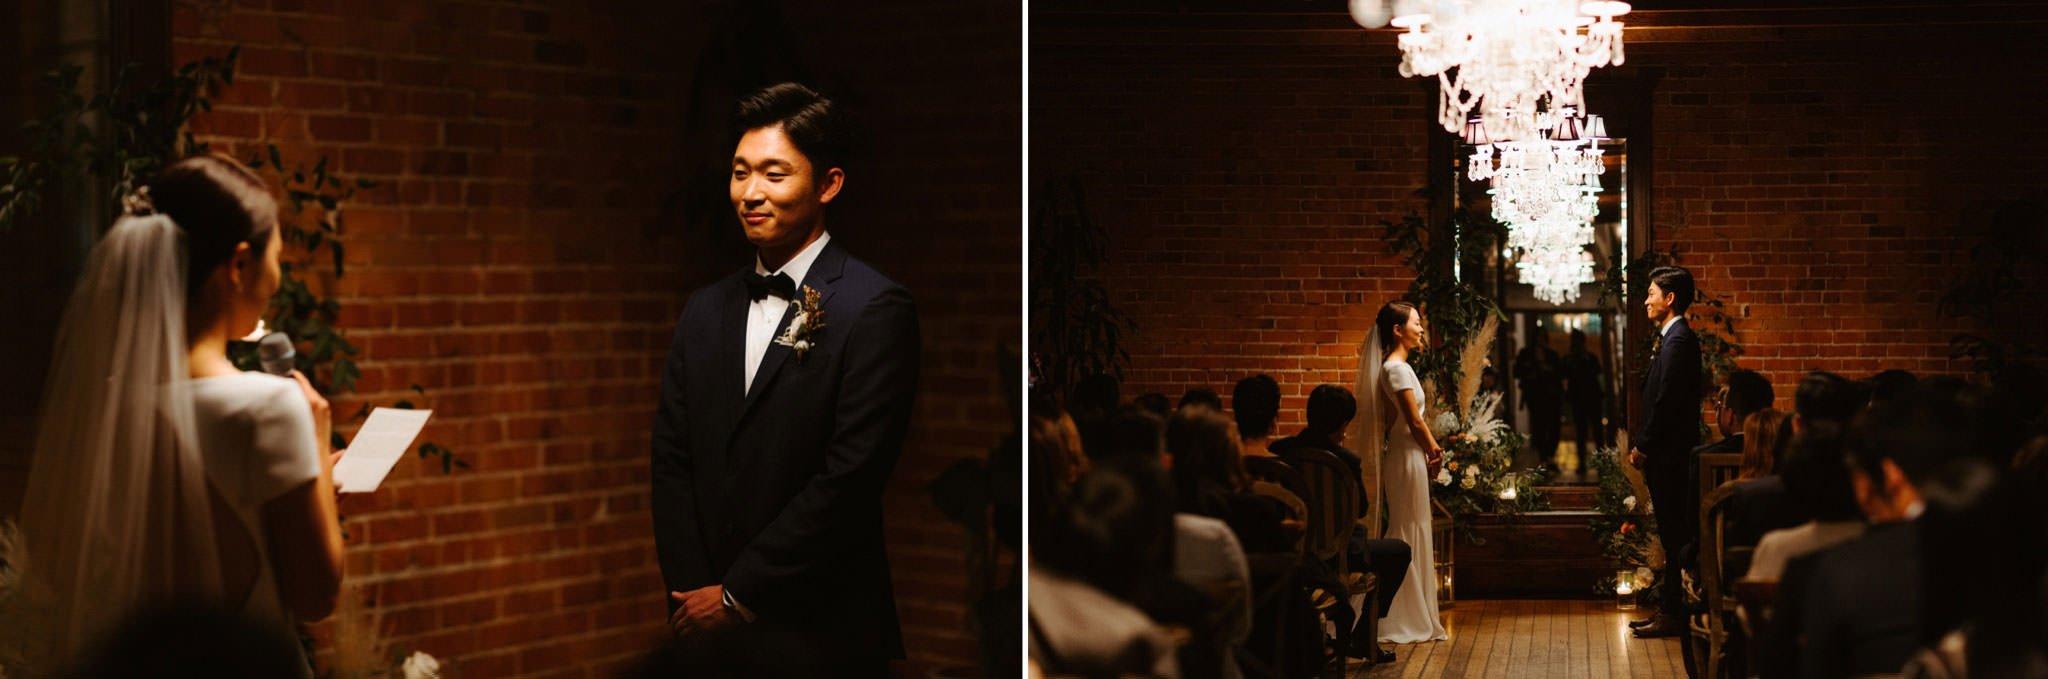 carondelet house wedding 099